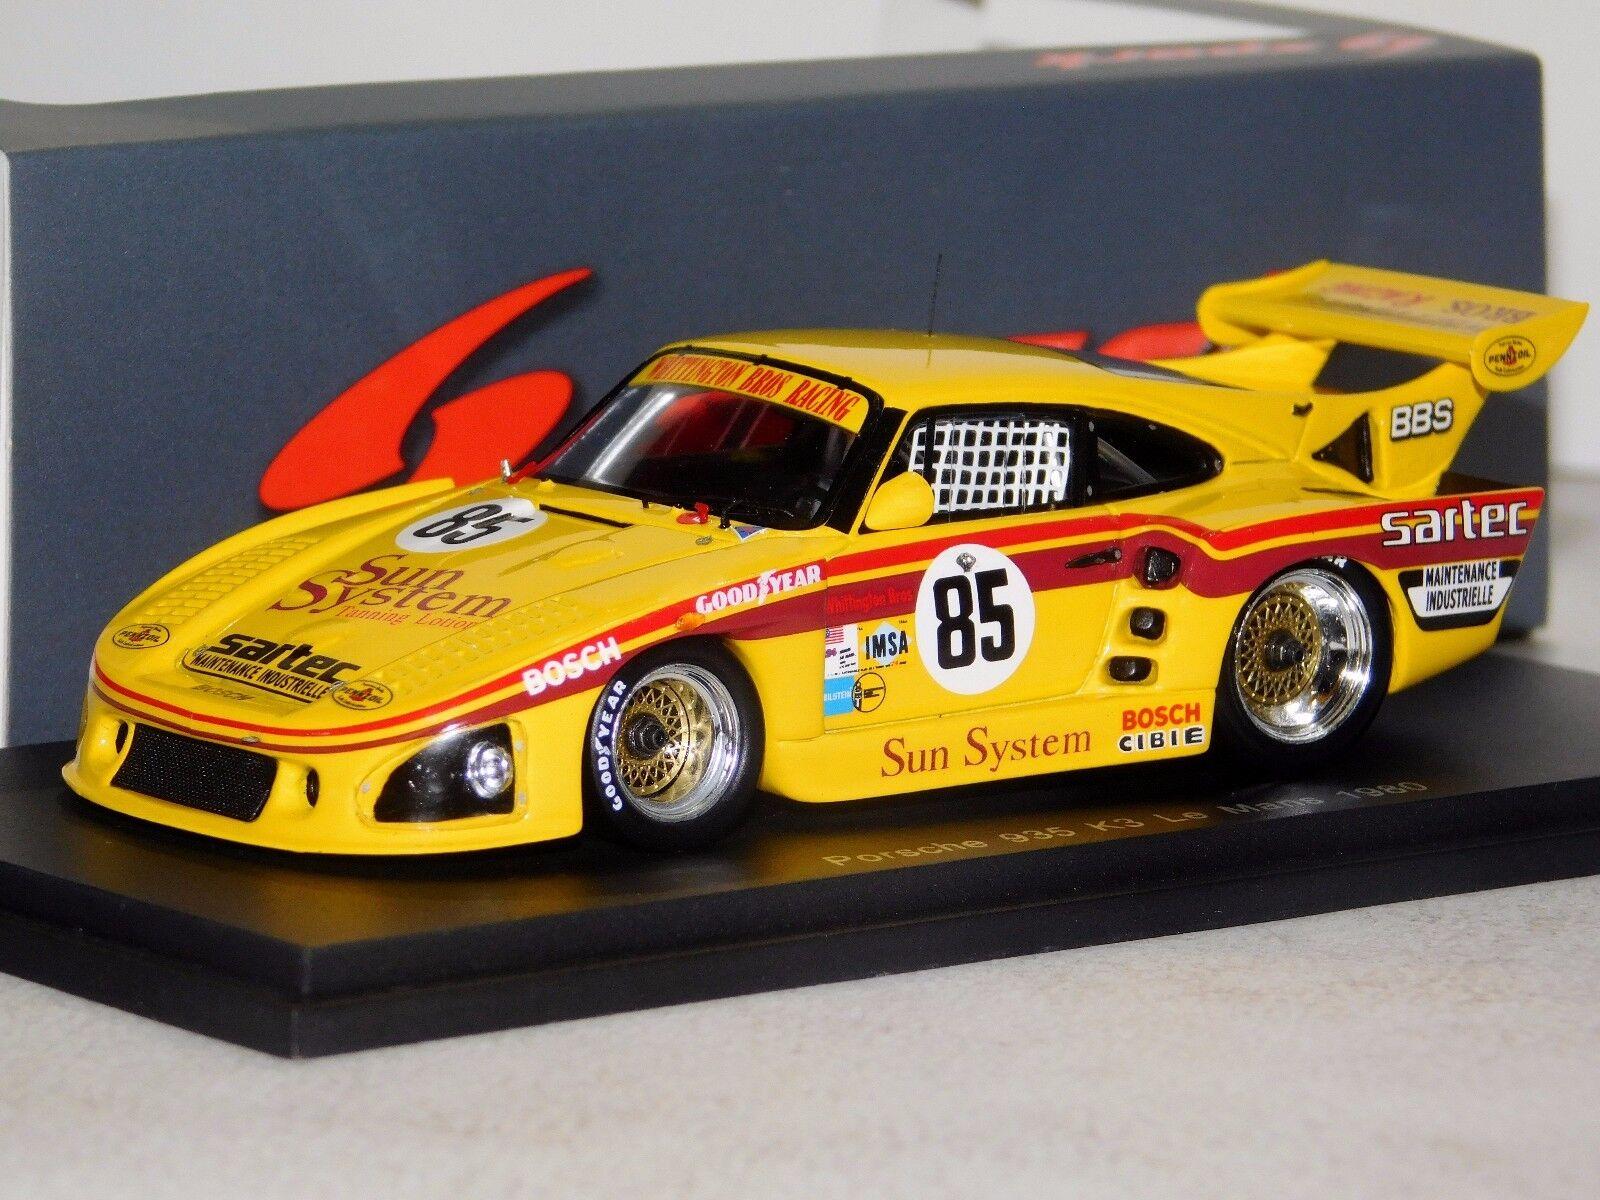 Porsche 935 K3  85 85 85 Le Mans 1980 por Dios, Heywood Whittington Spark S5500 1 43 9d0452